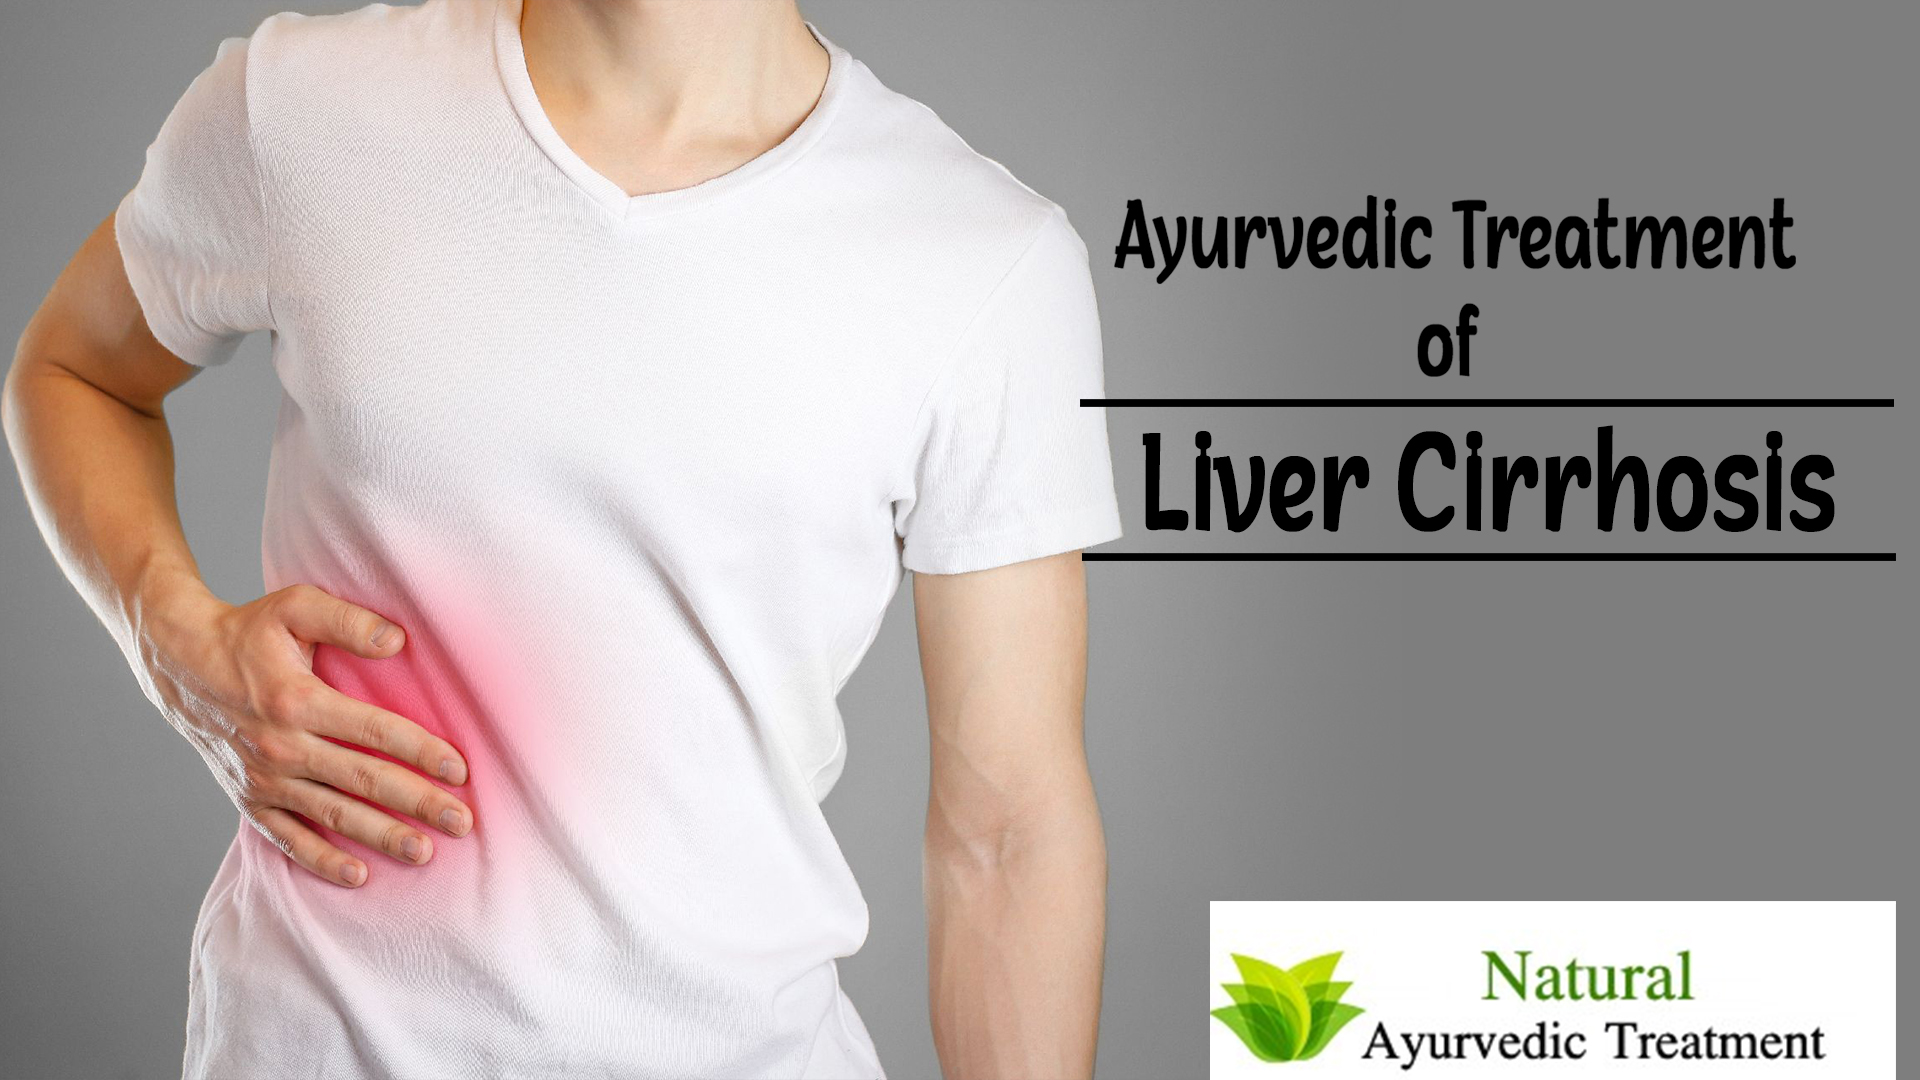 Ayurvedic Treatment of Liver Cirrhosis - Causes, Symptoms, Diagnosis & Herbal Remedies